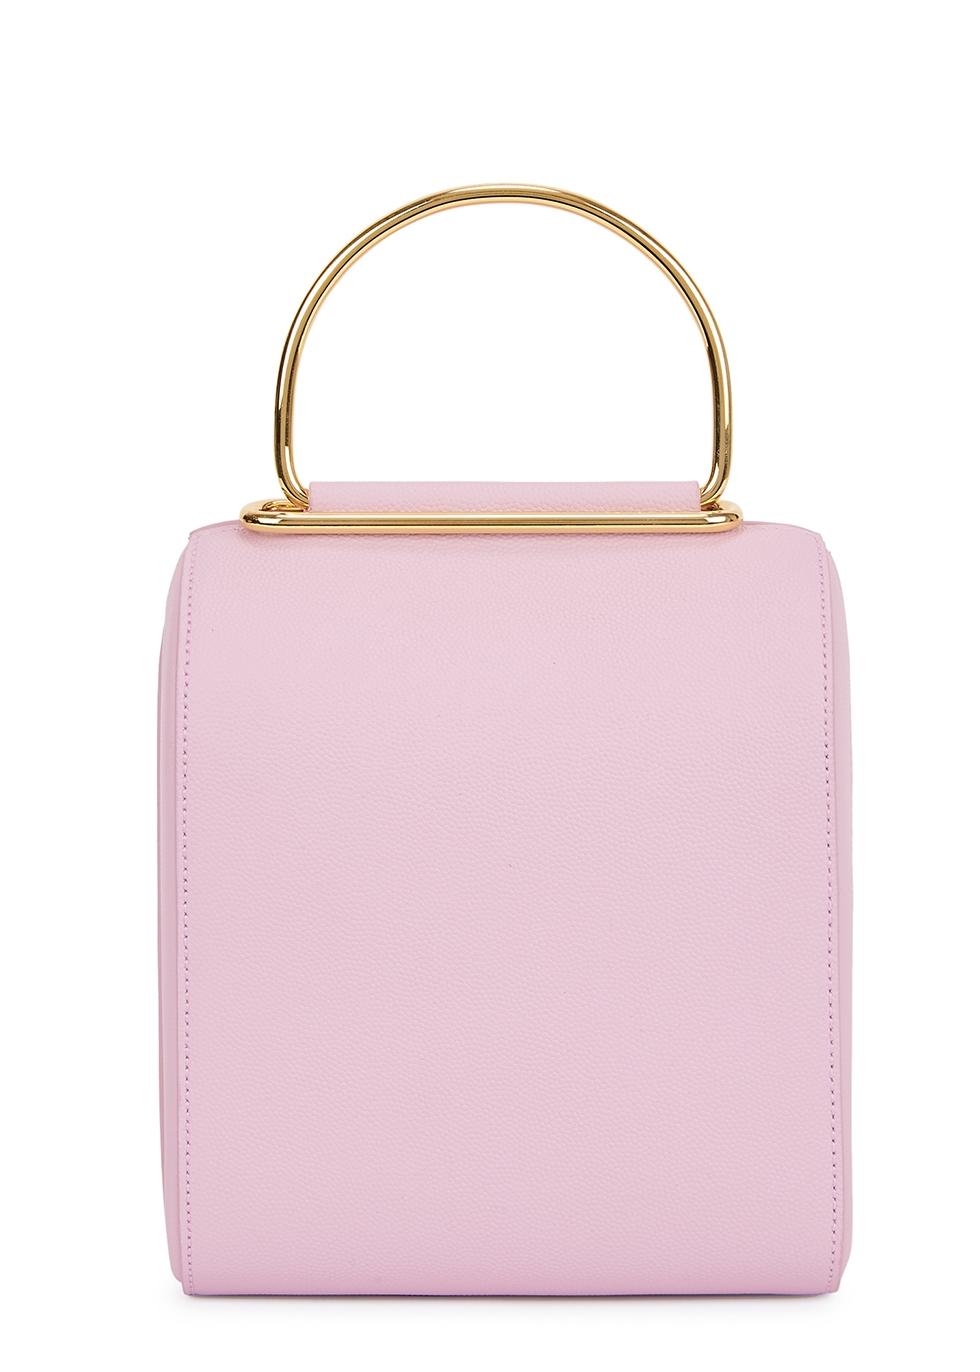 Besa small lilac leather box bag - Roksanda